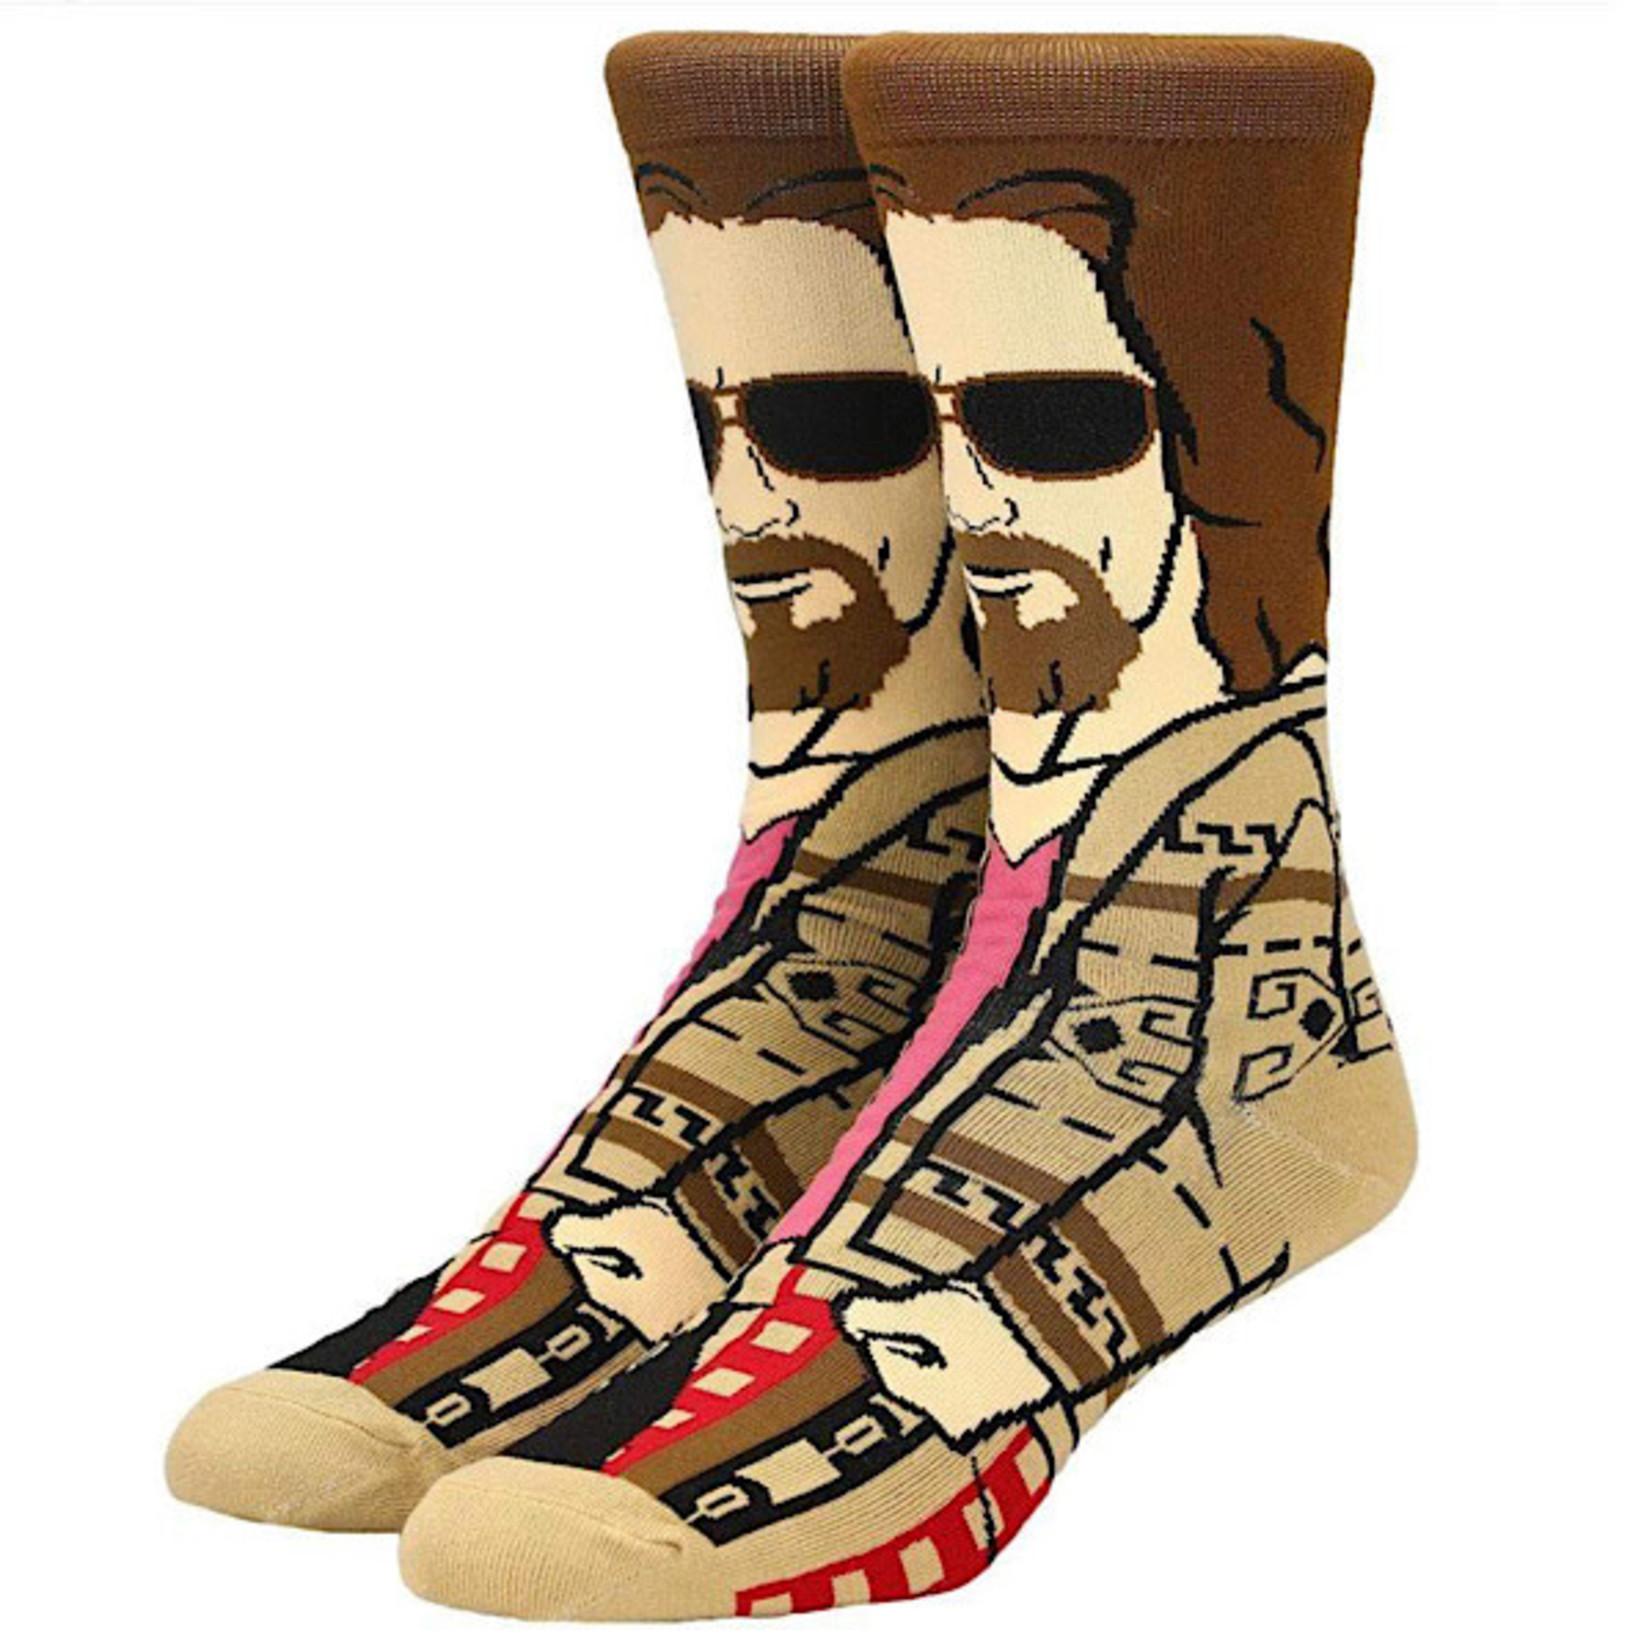 Socks (Mens) - The Big Lebowski